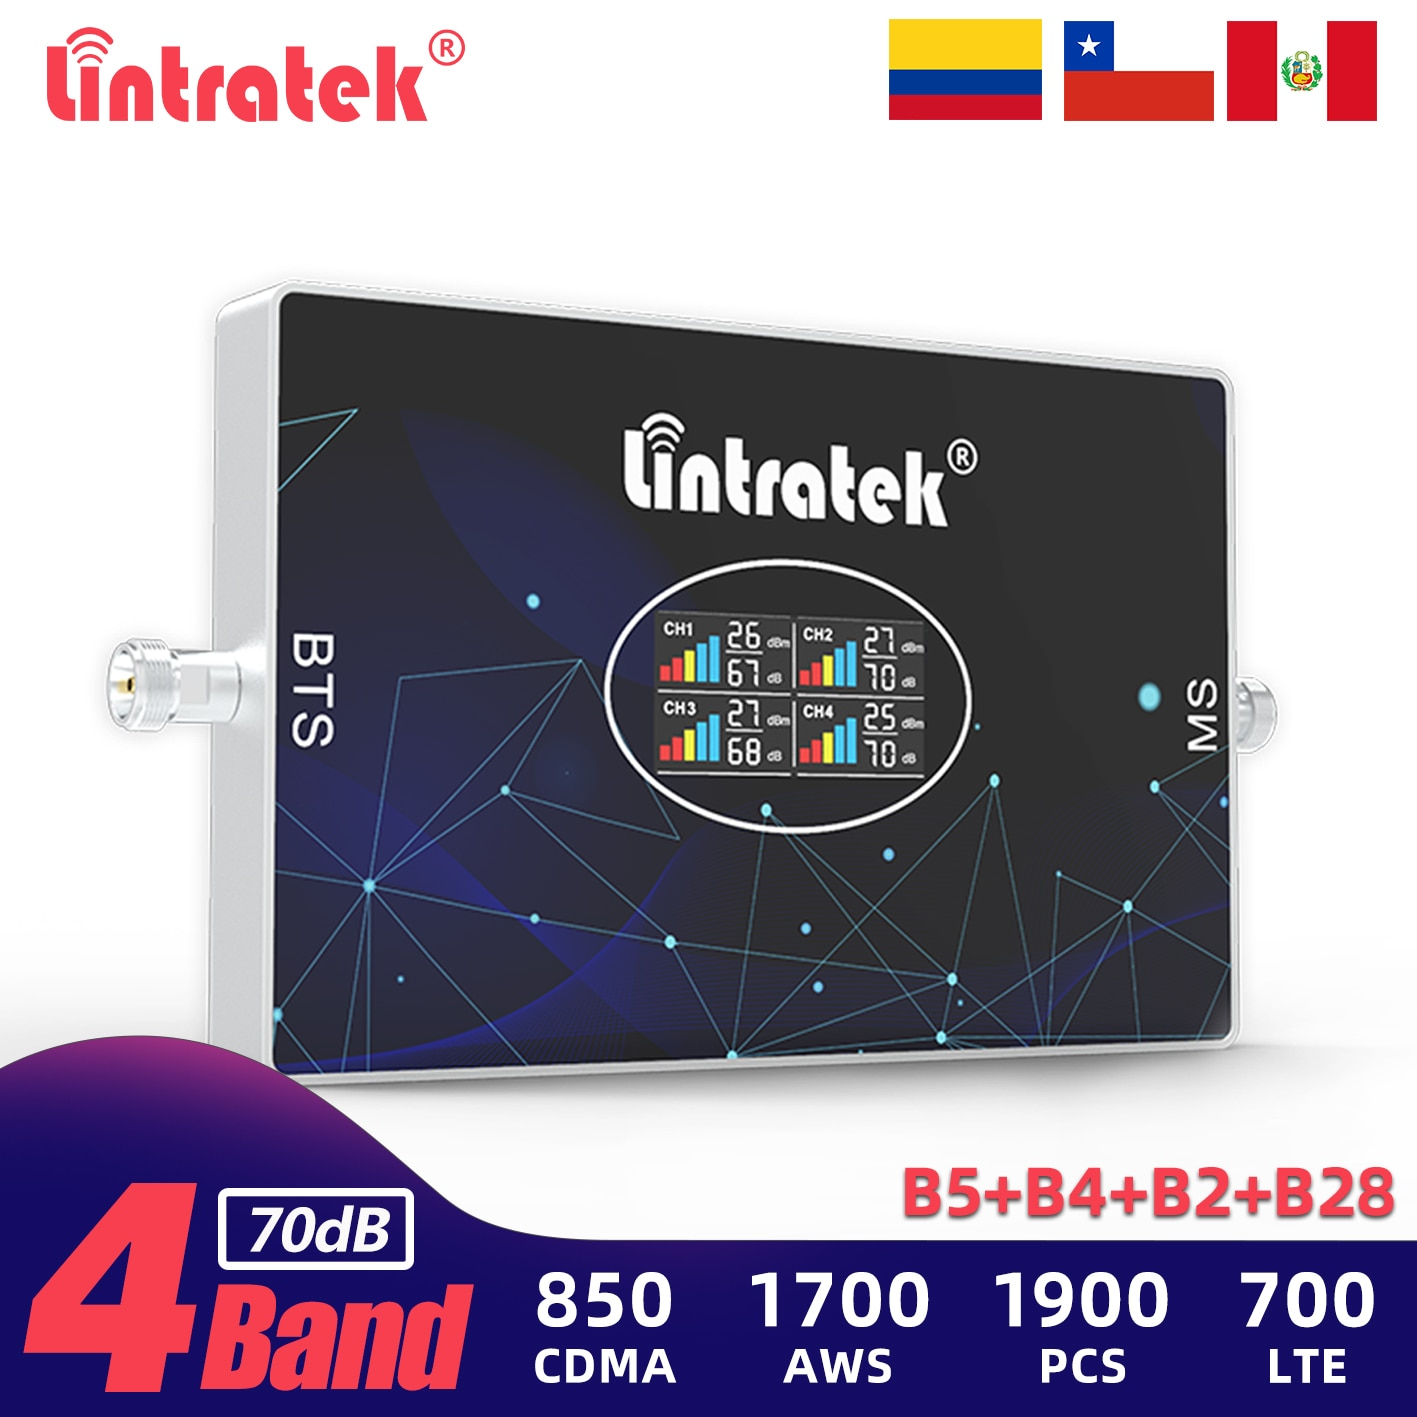 Lintratek أربعة الموجات إشارة مكرر 850 700 1900 1700 الفرقة 28 الخلوية الداعم 2G GSM 3G 4G LTE الهاتف الخليوي شبكة مكبر للصوت